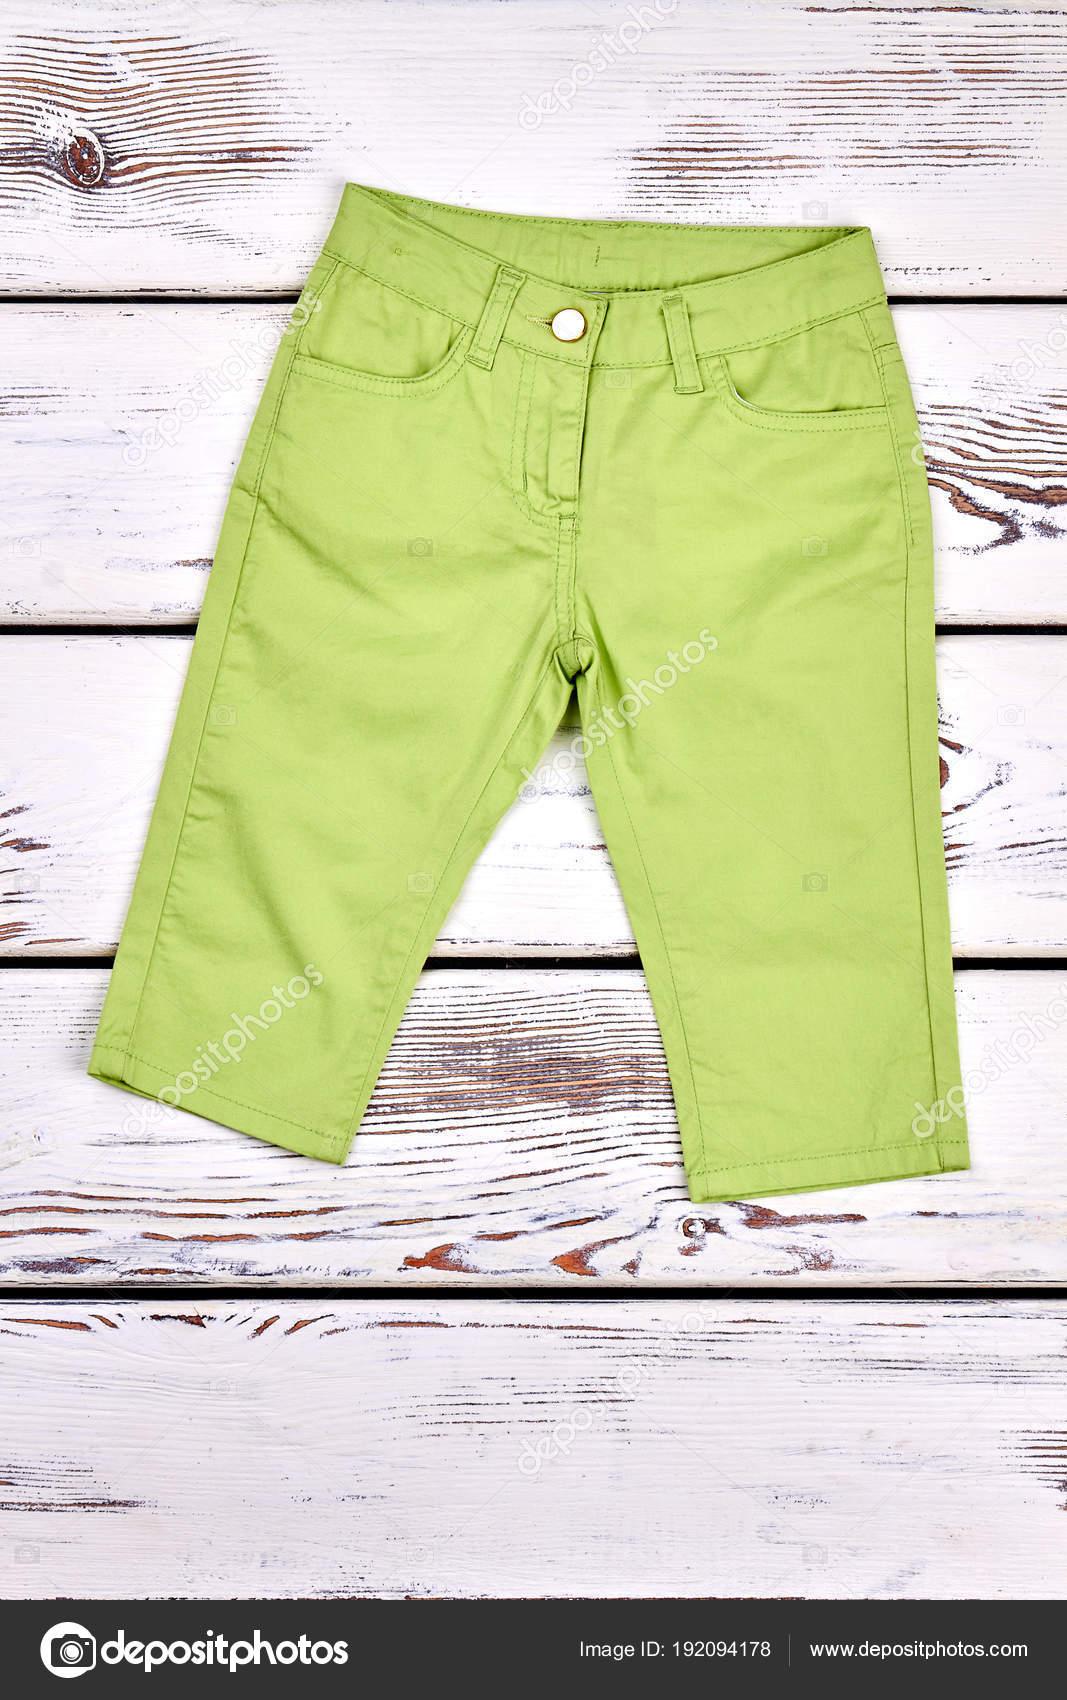 9b648fa50a769 Baby neue grüne Sommerhose. — Stockfoto © Denisfilm #192094178